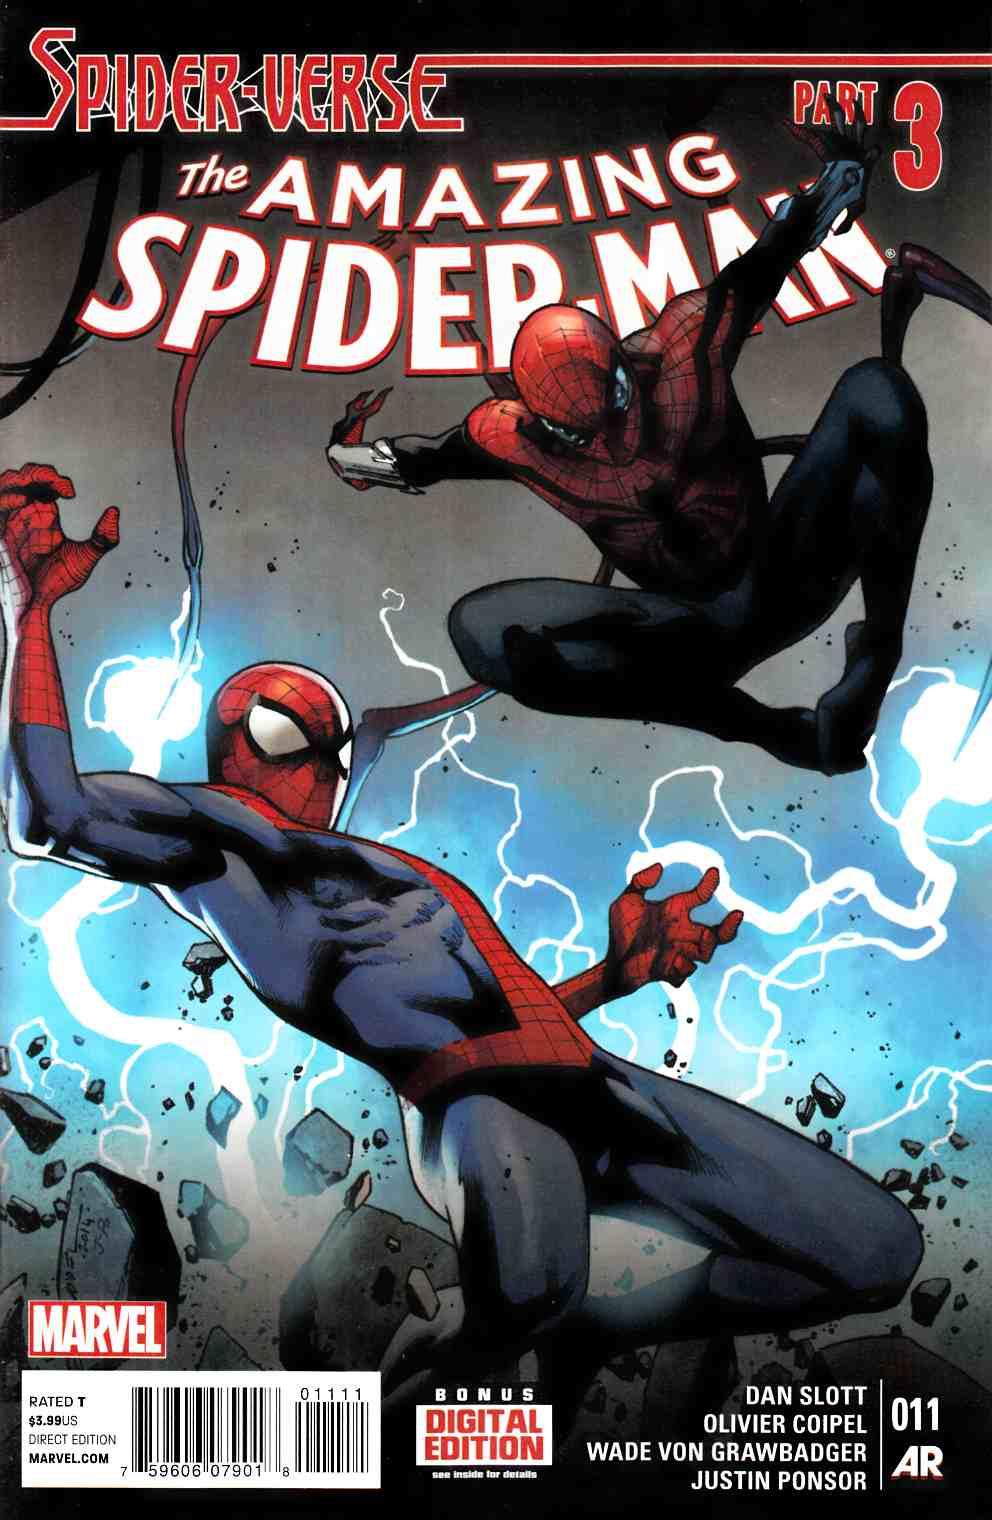 The Amazing Spider-Man #11 Part 3, Marvel // Dan Slott.